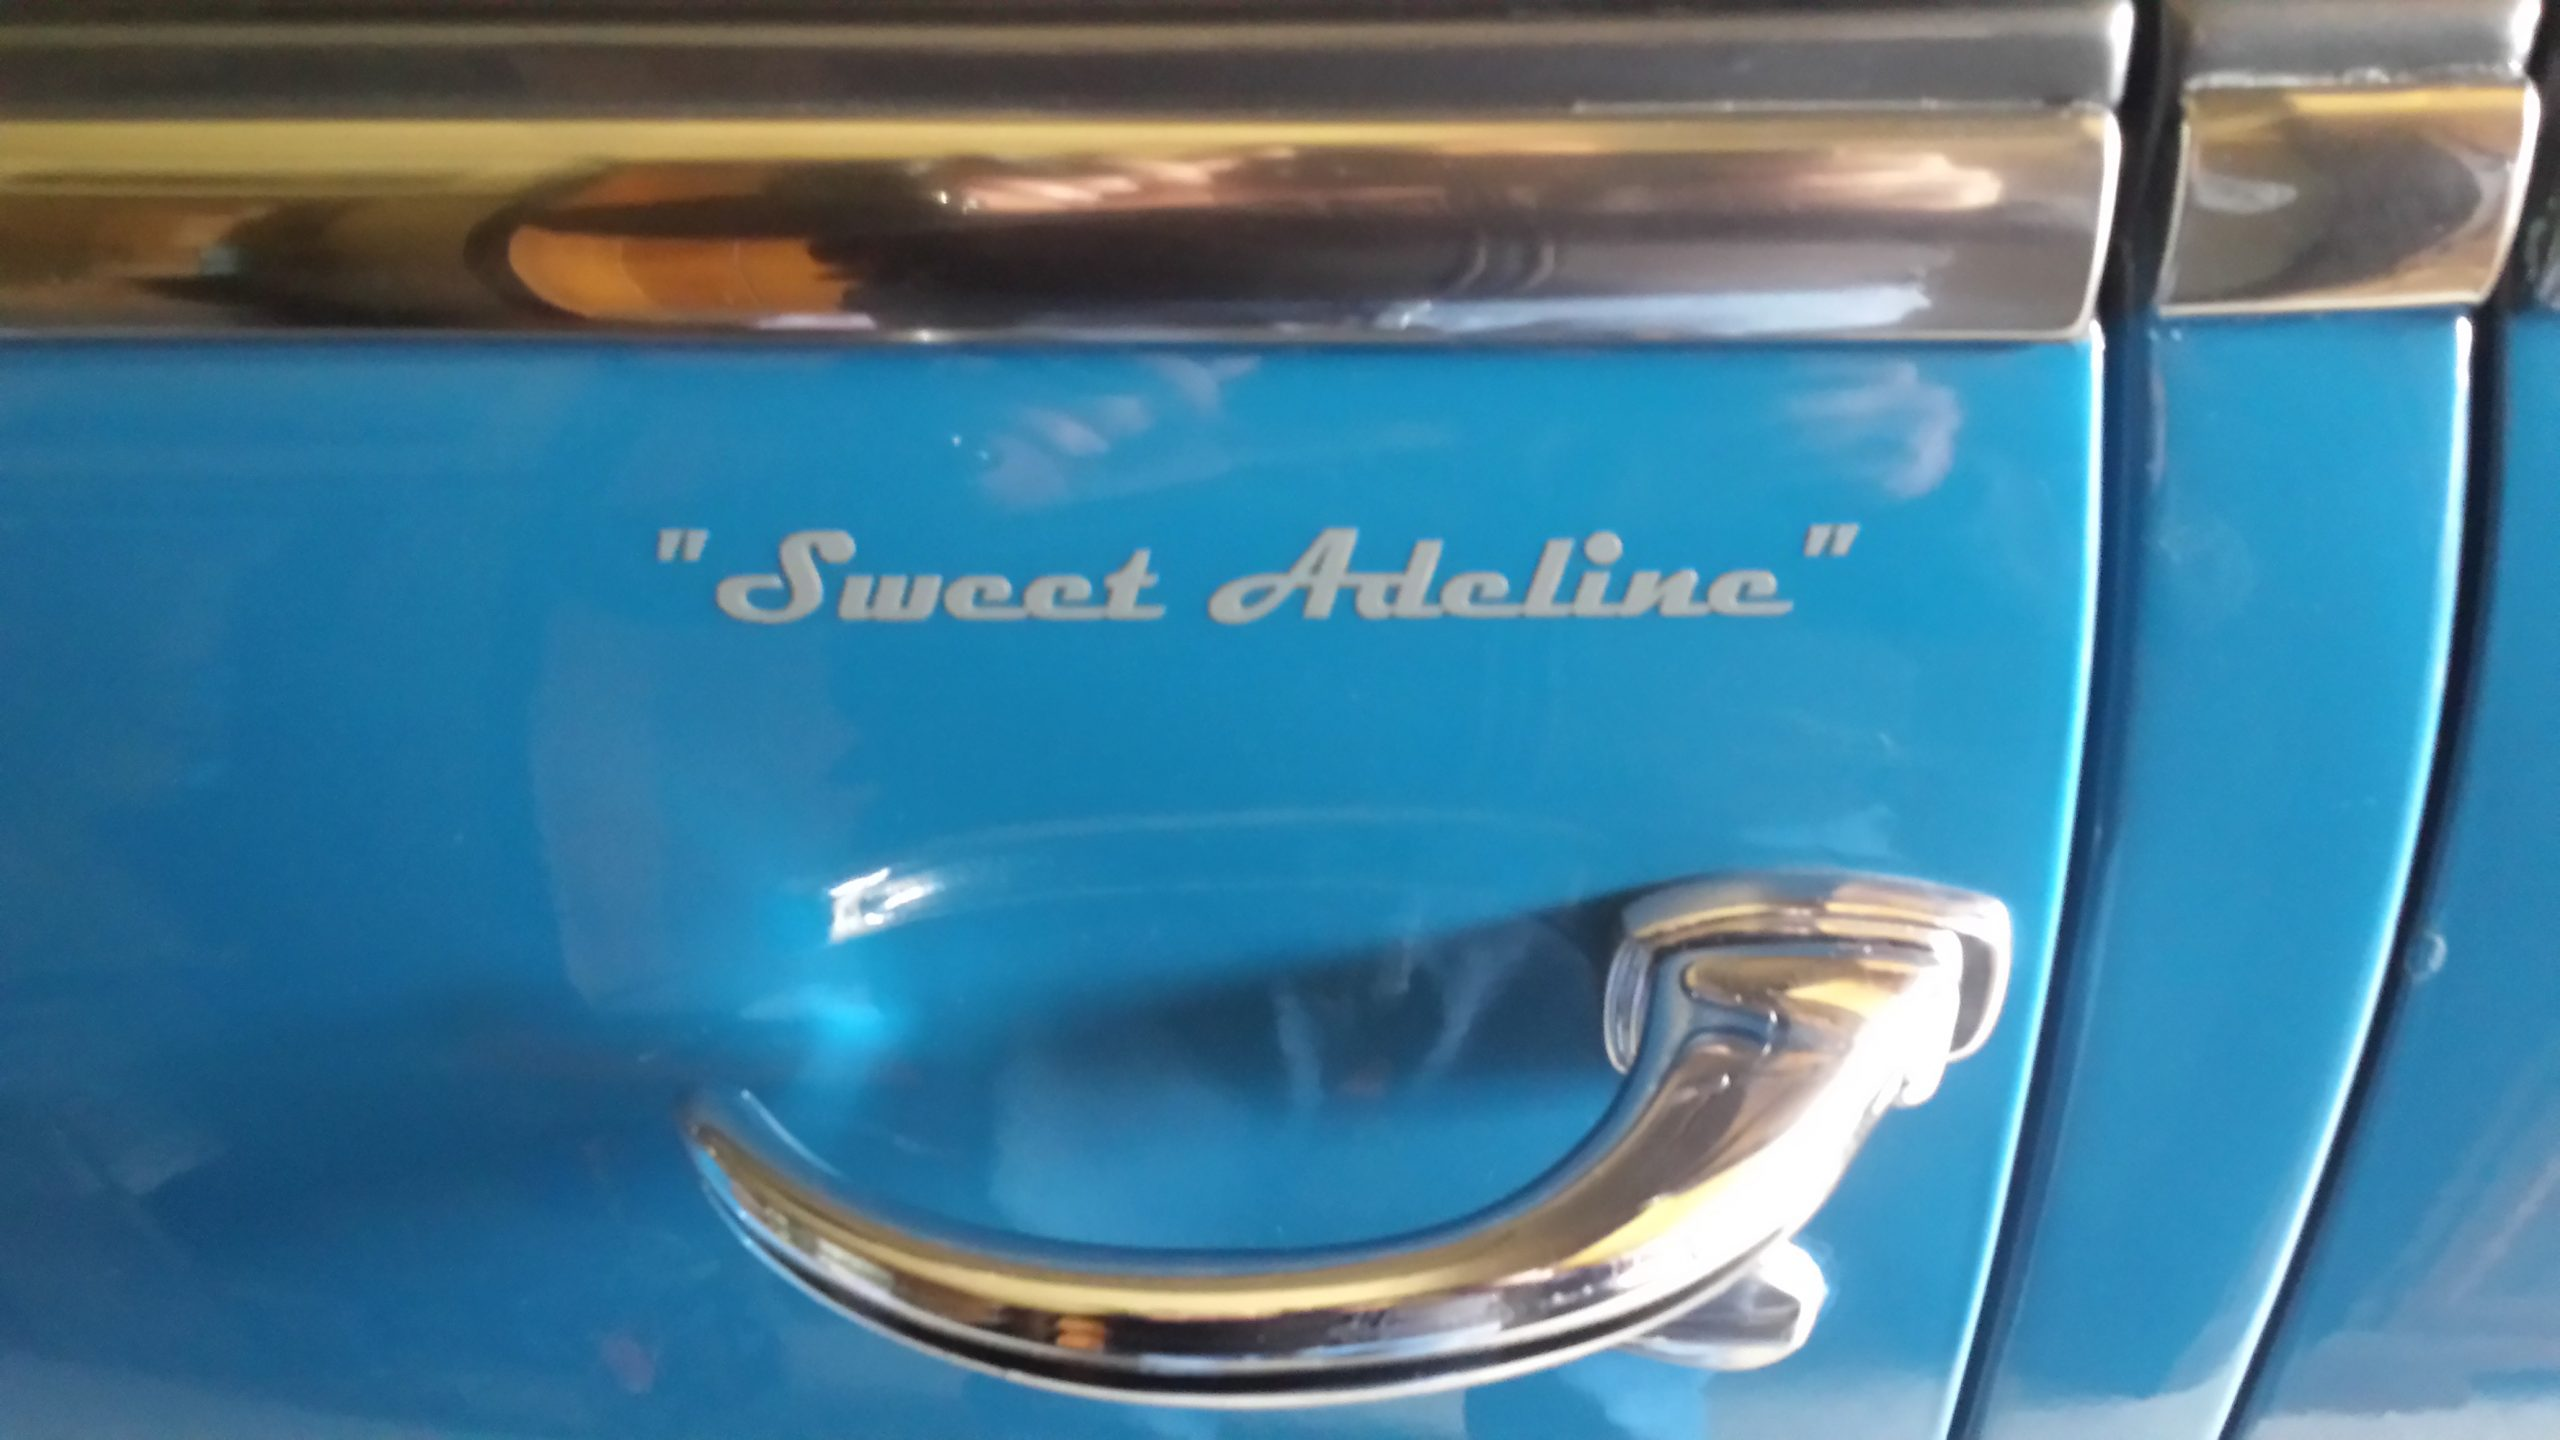 1948 Chevrolet Fleetmaster sweet adeline logo